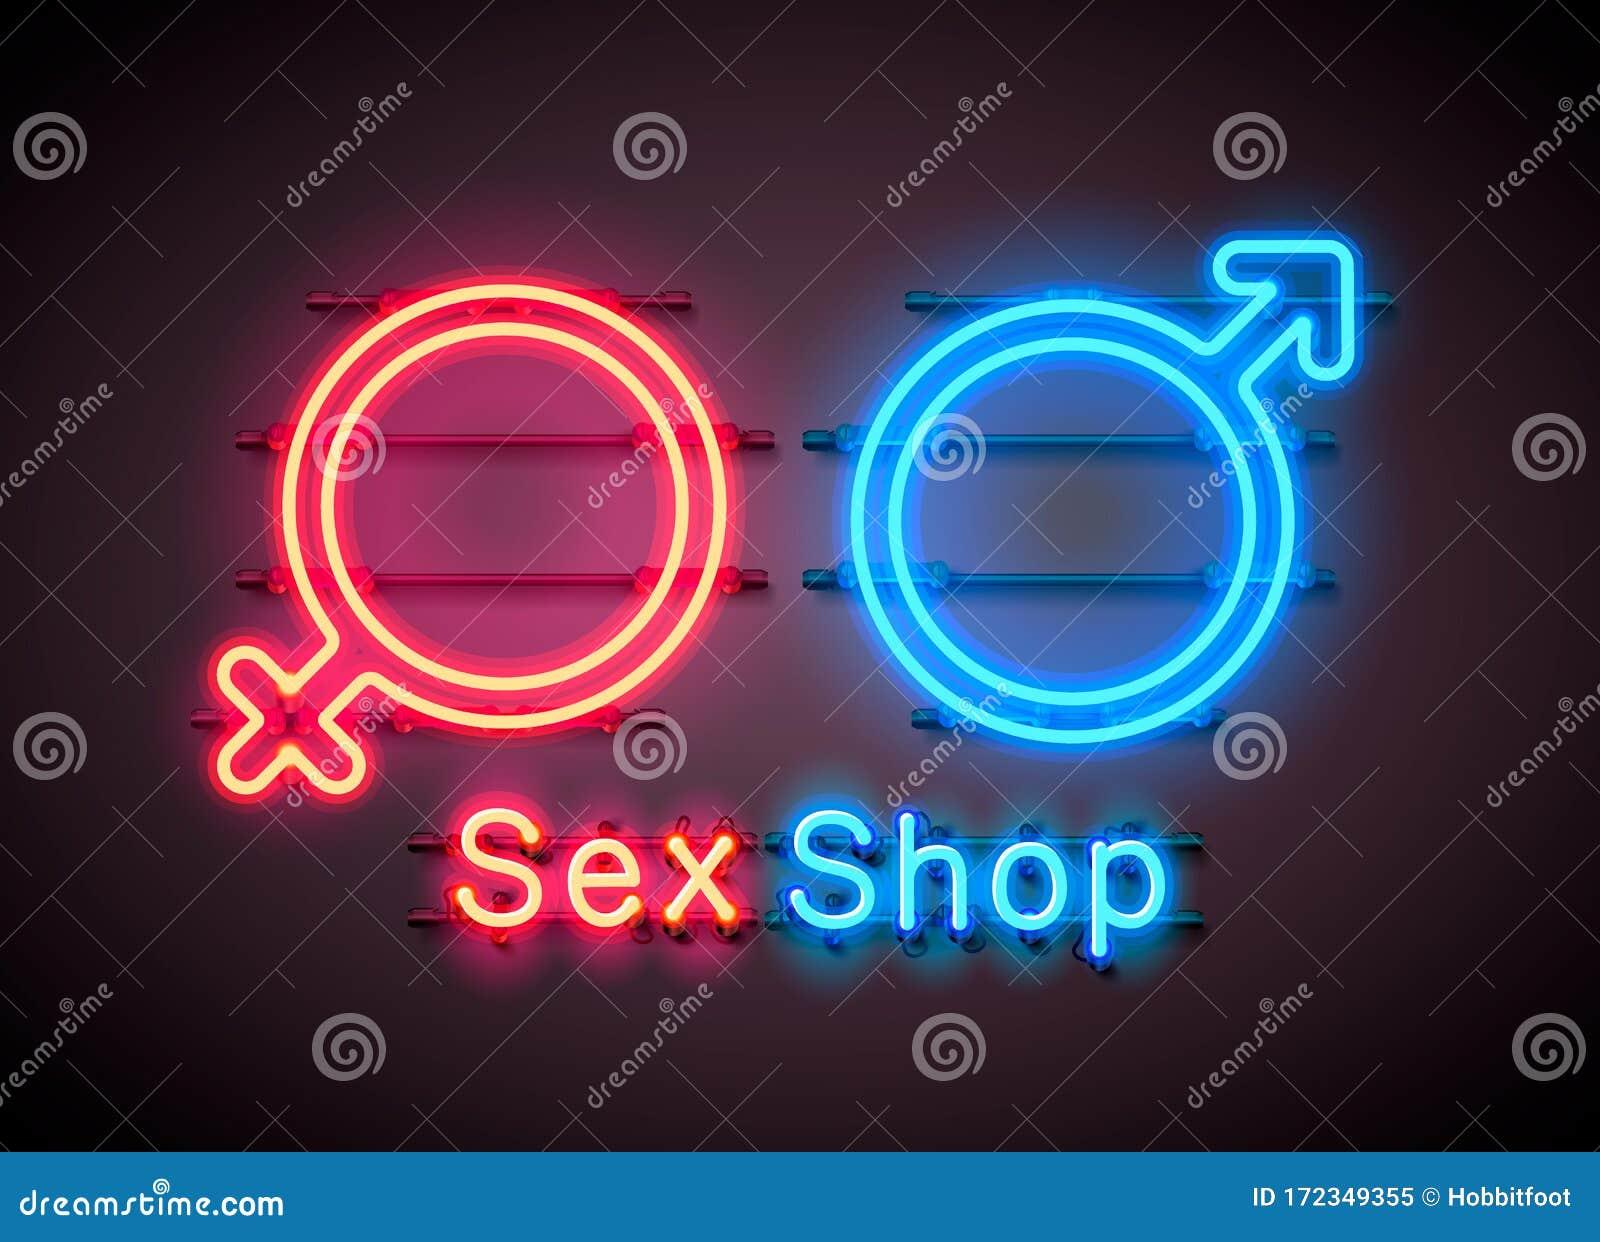 Sex shop free